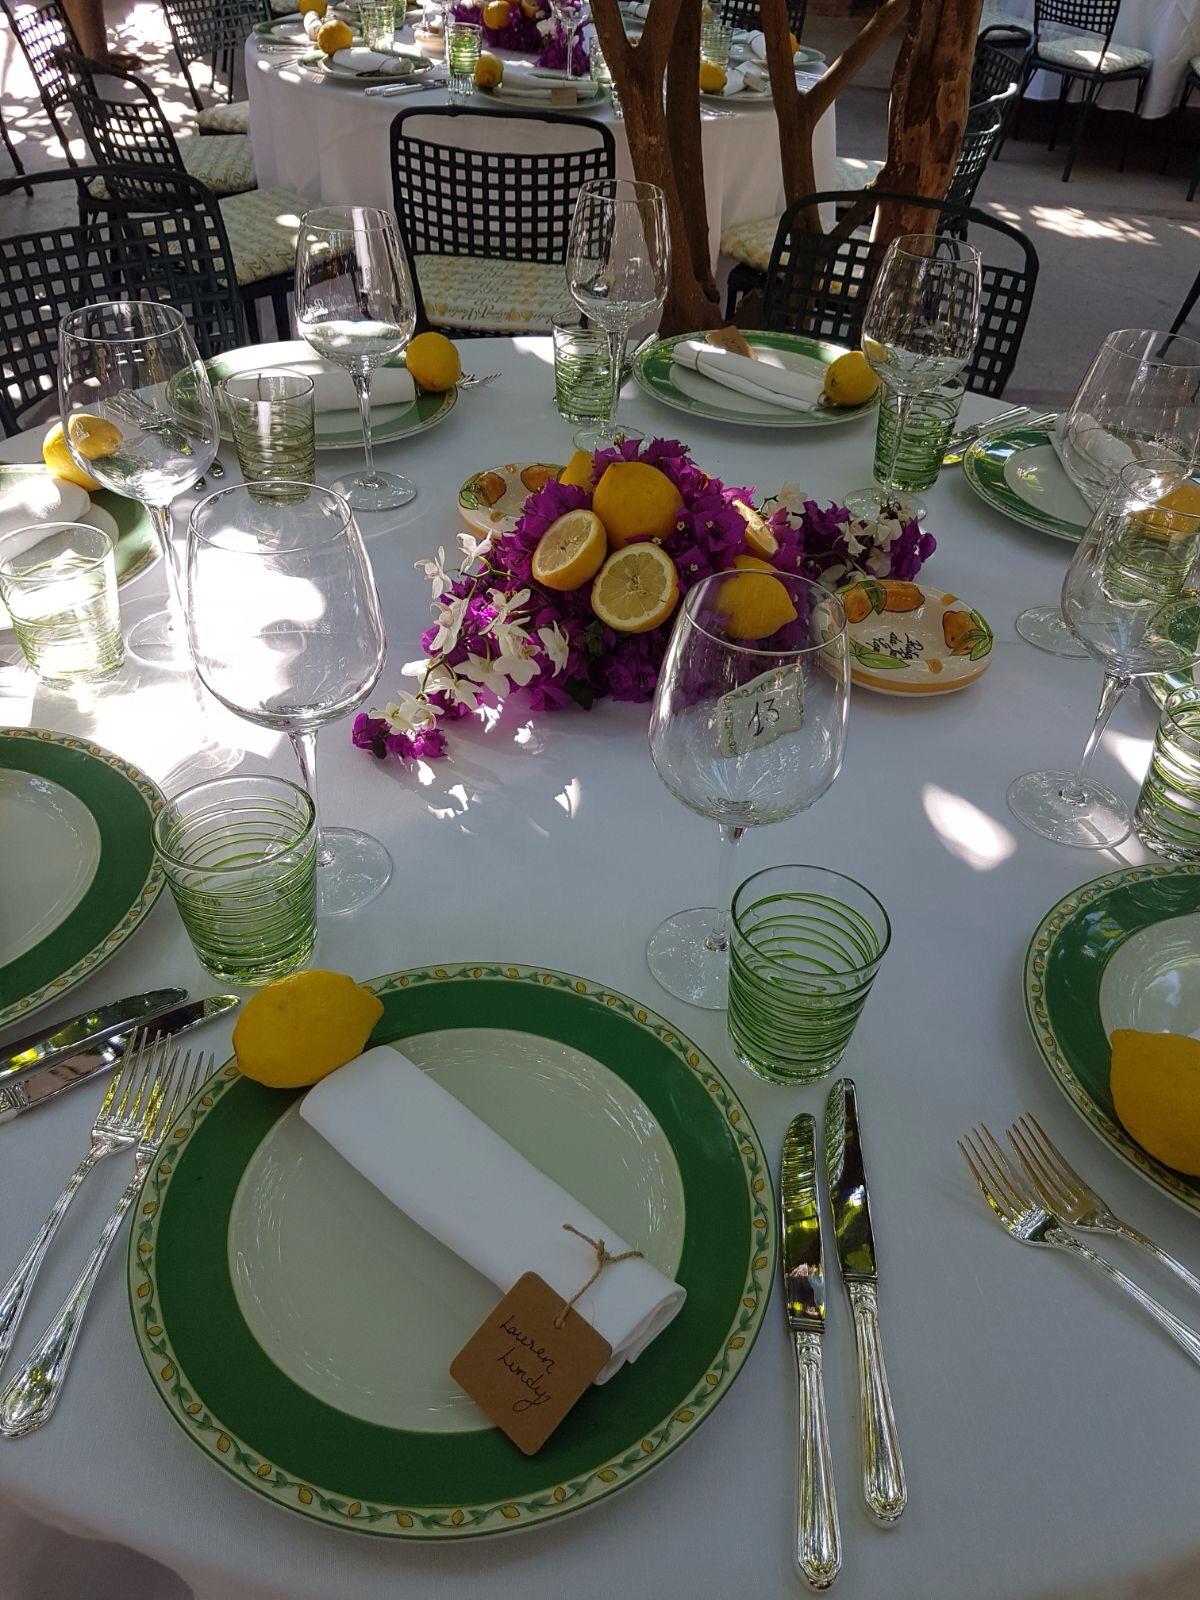 https://www.weddingamalfi.com/wp-content/uploads/Nathalie-and-Benjamin-wedding-day-in-Positano-4.jpg